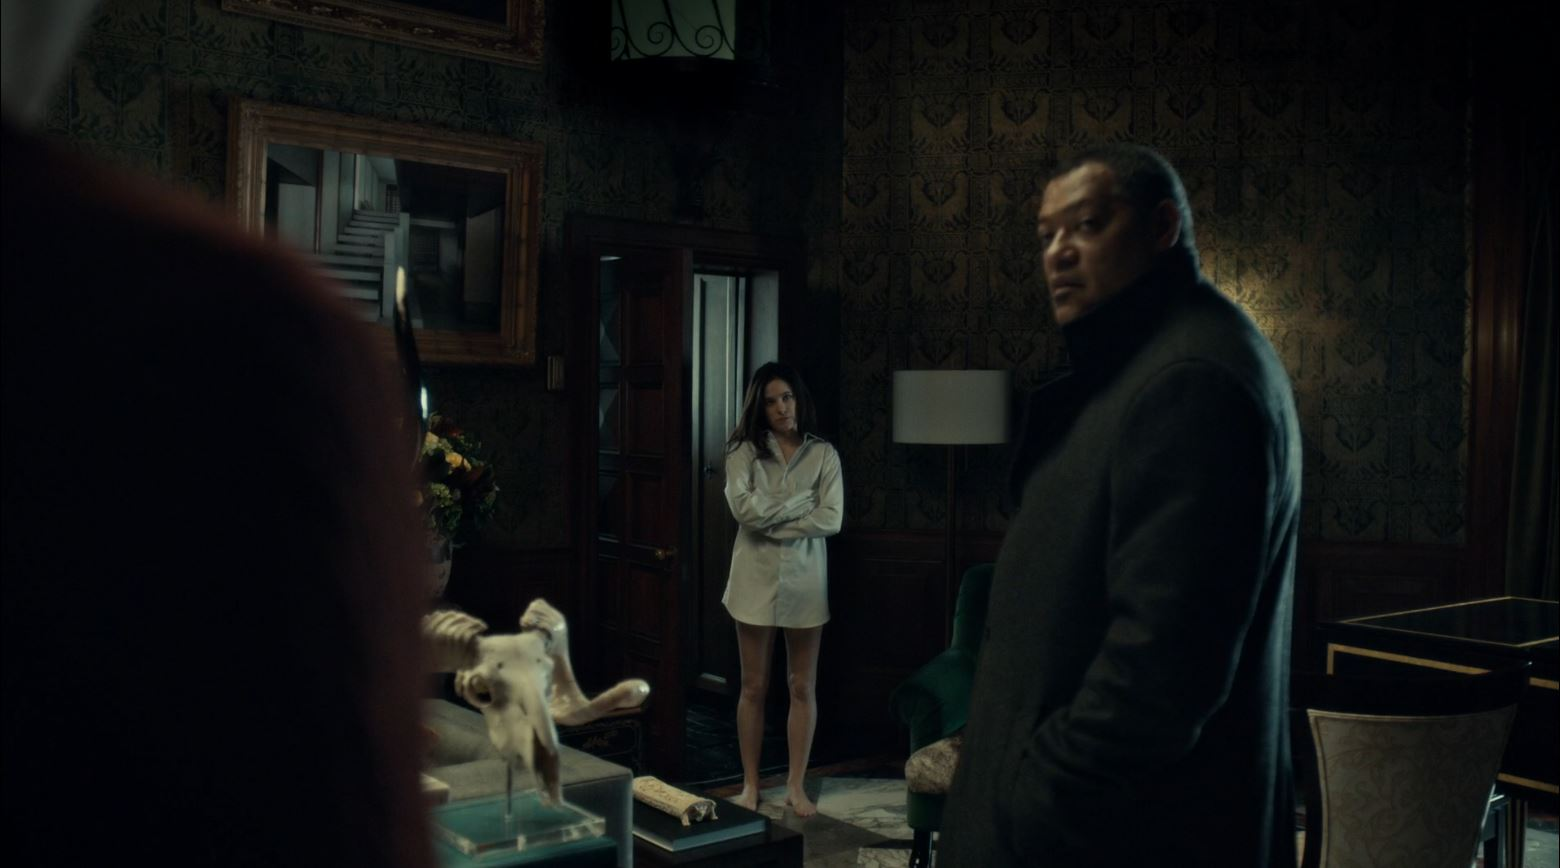 Hannibal S2Ep6 Futamono Review - Caroline Dhavernas as Dr. Alana Bloom